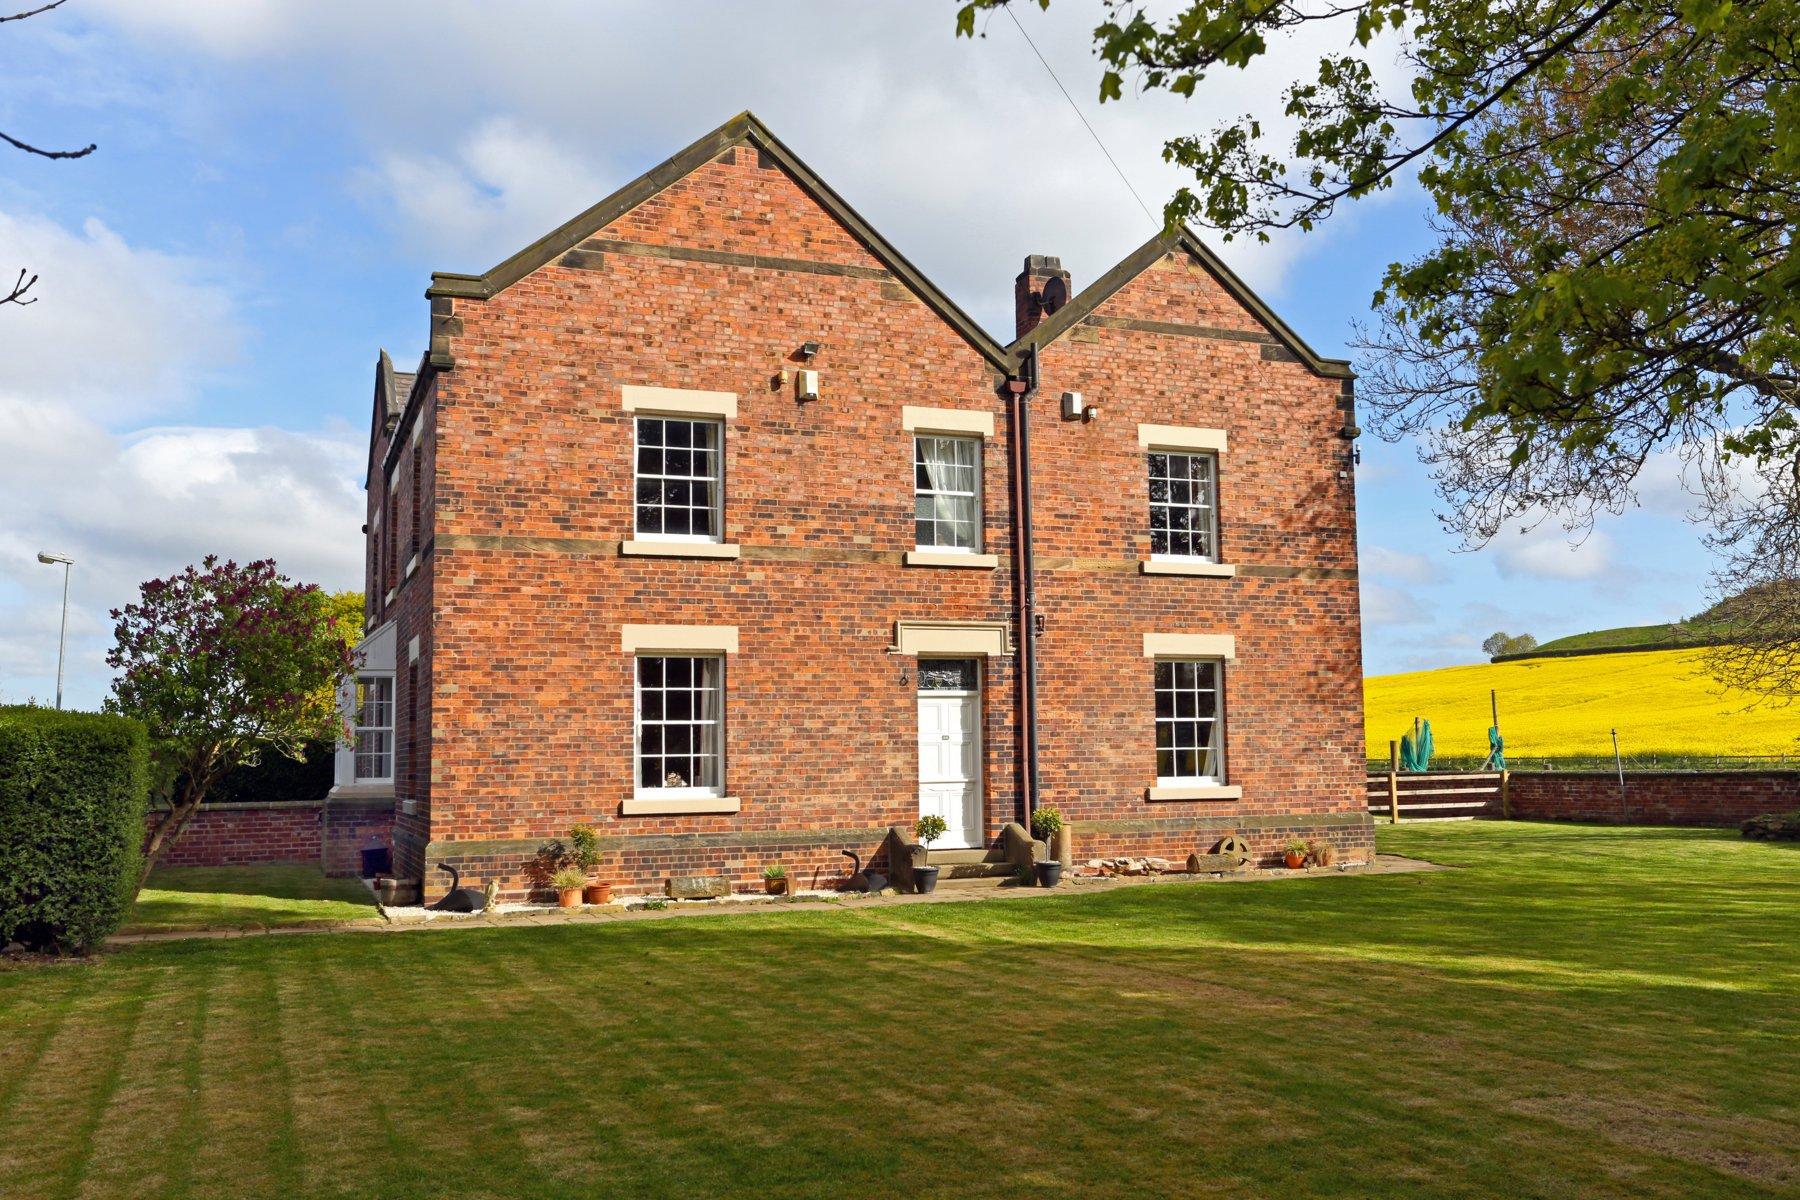 Semi Rural Property For Sale Outside Of Bath